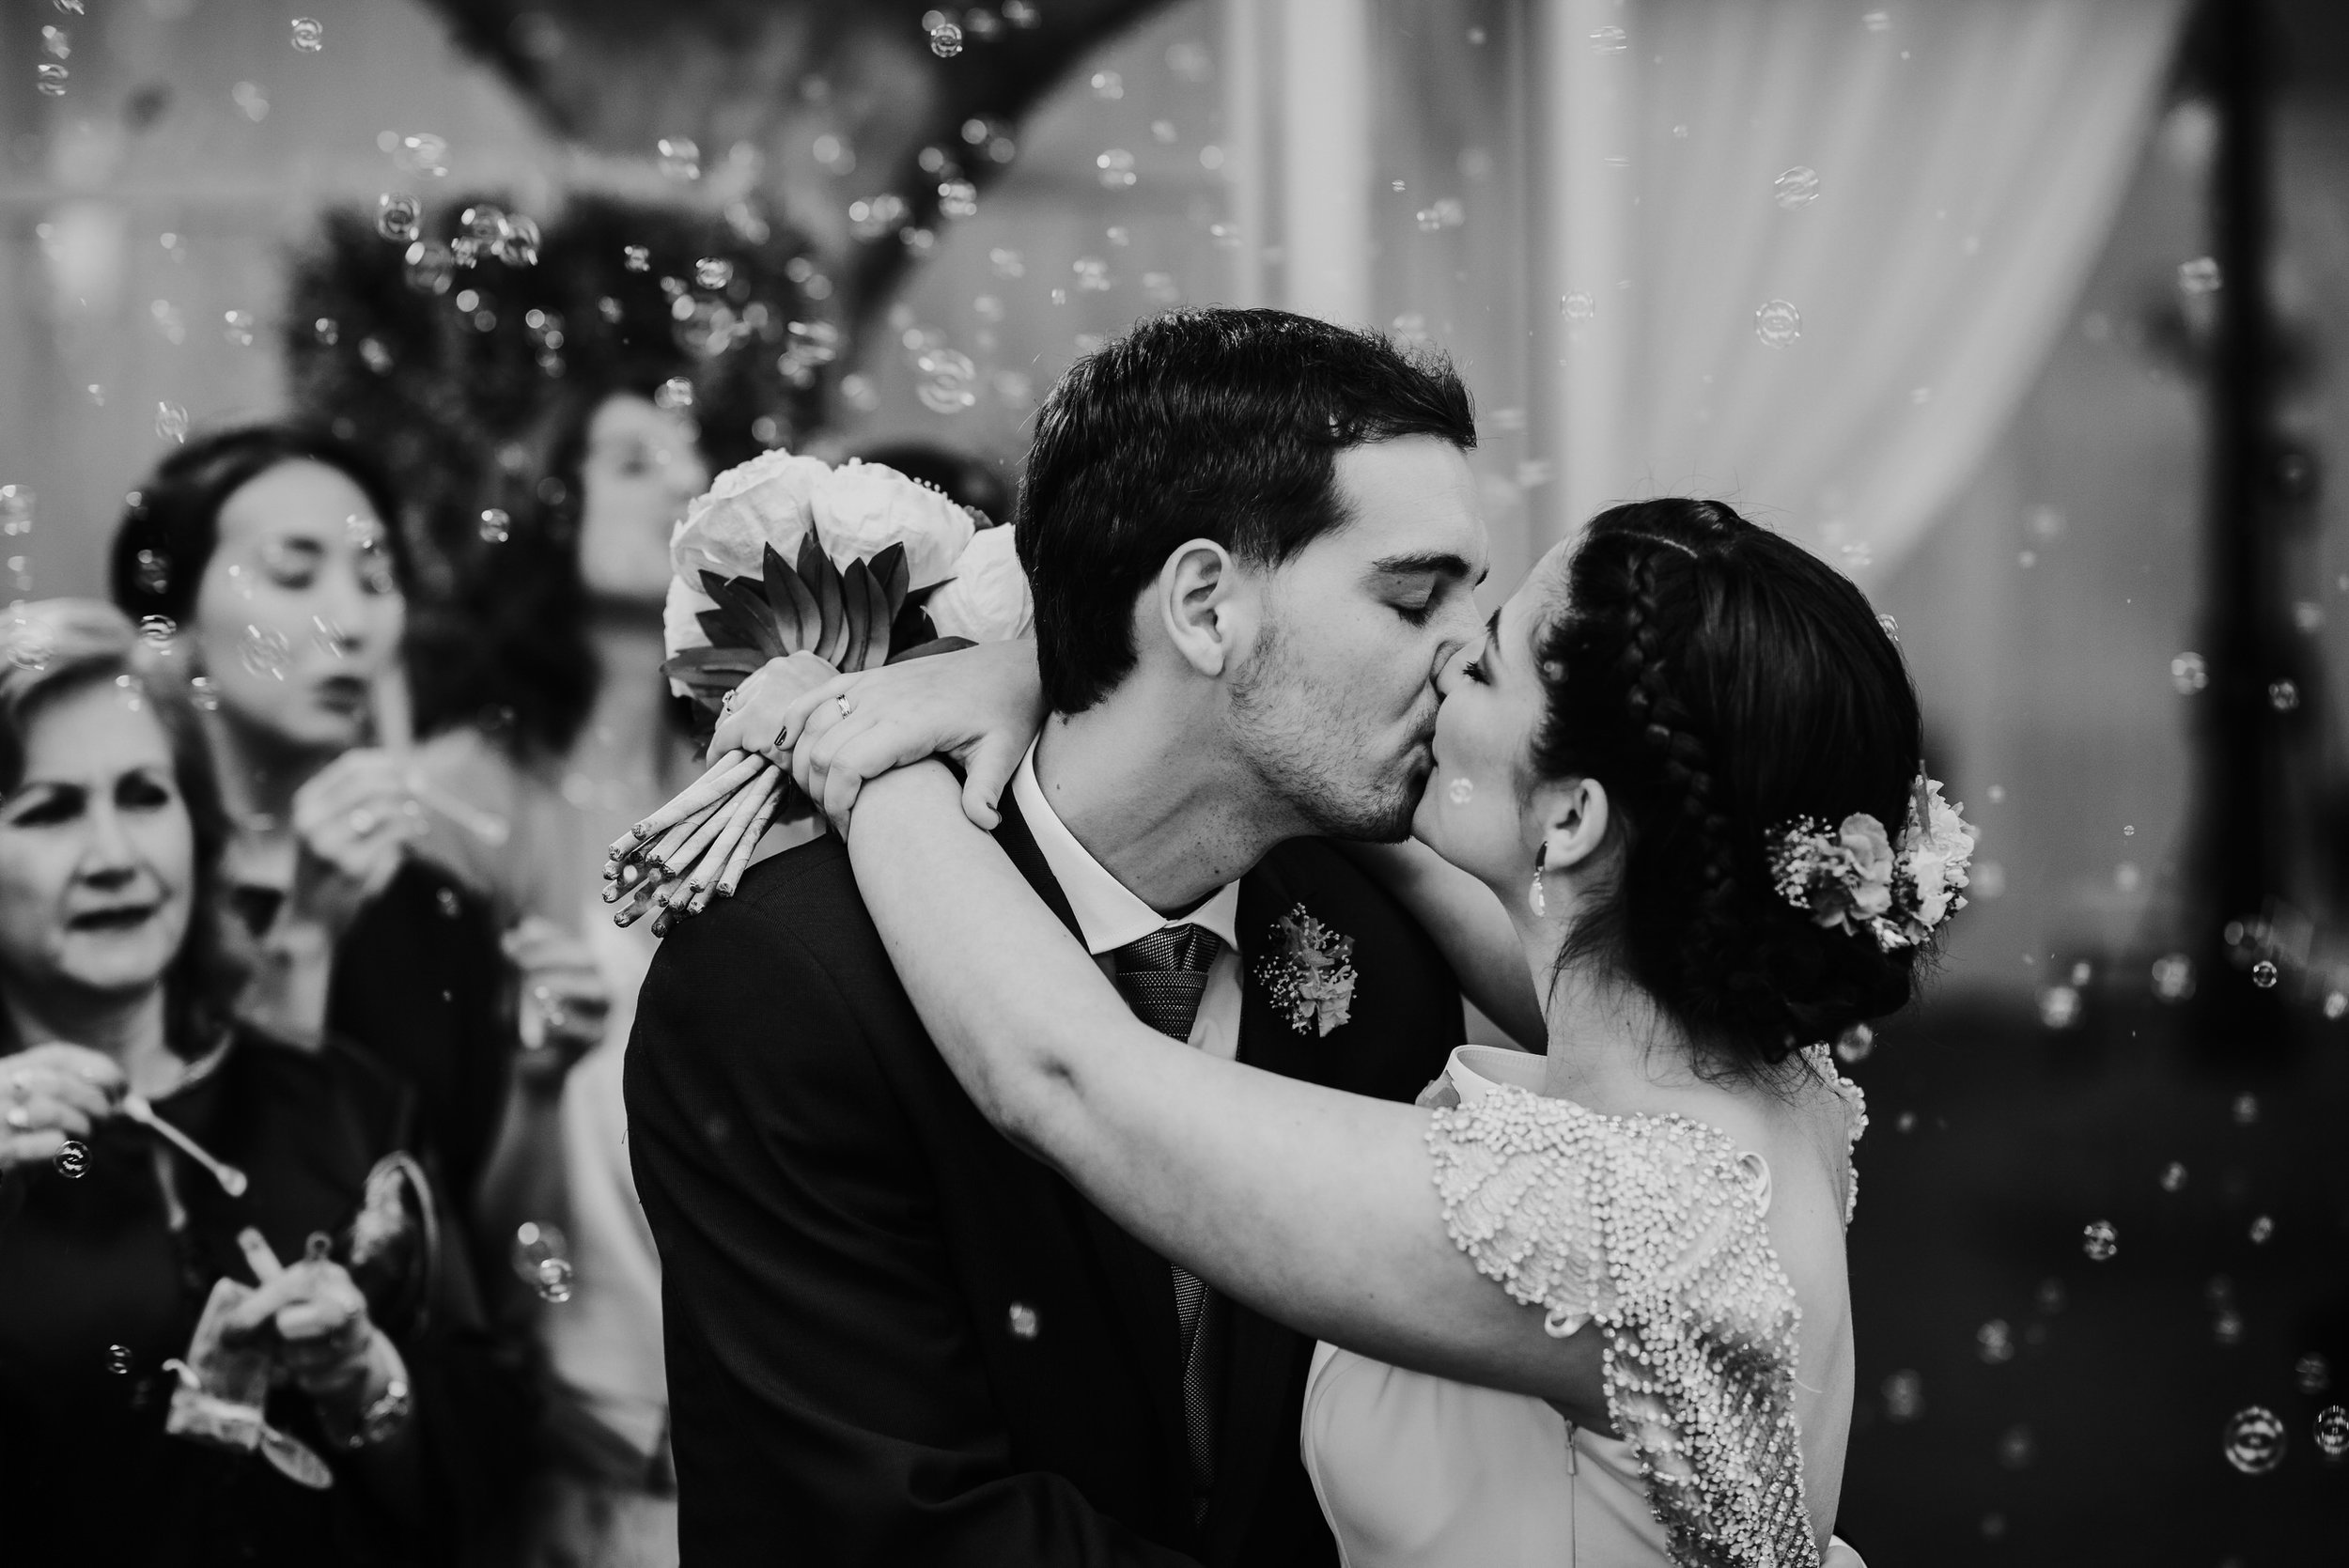 Laura & Rubén - boda en utrera - Santa clotilde- Manolo mayo - Fotografo de boda - Andrés Amarillo AAA_1075-Exposure (85).jpg